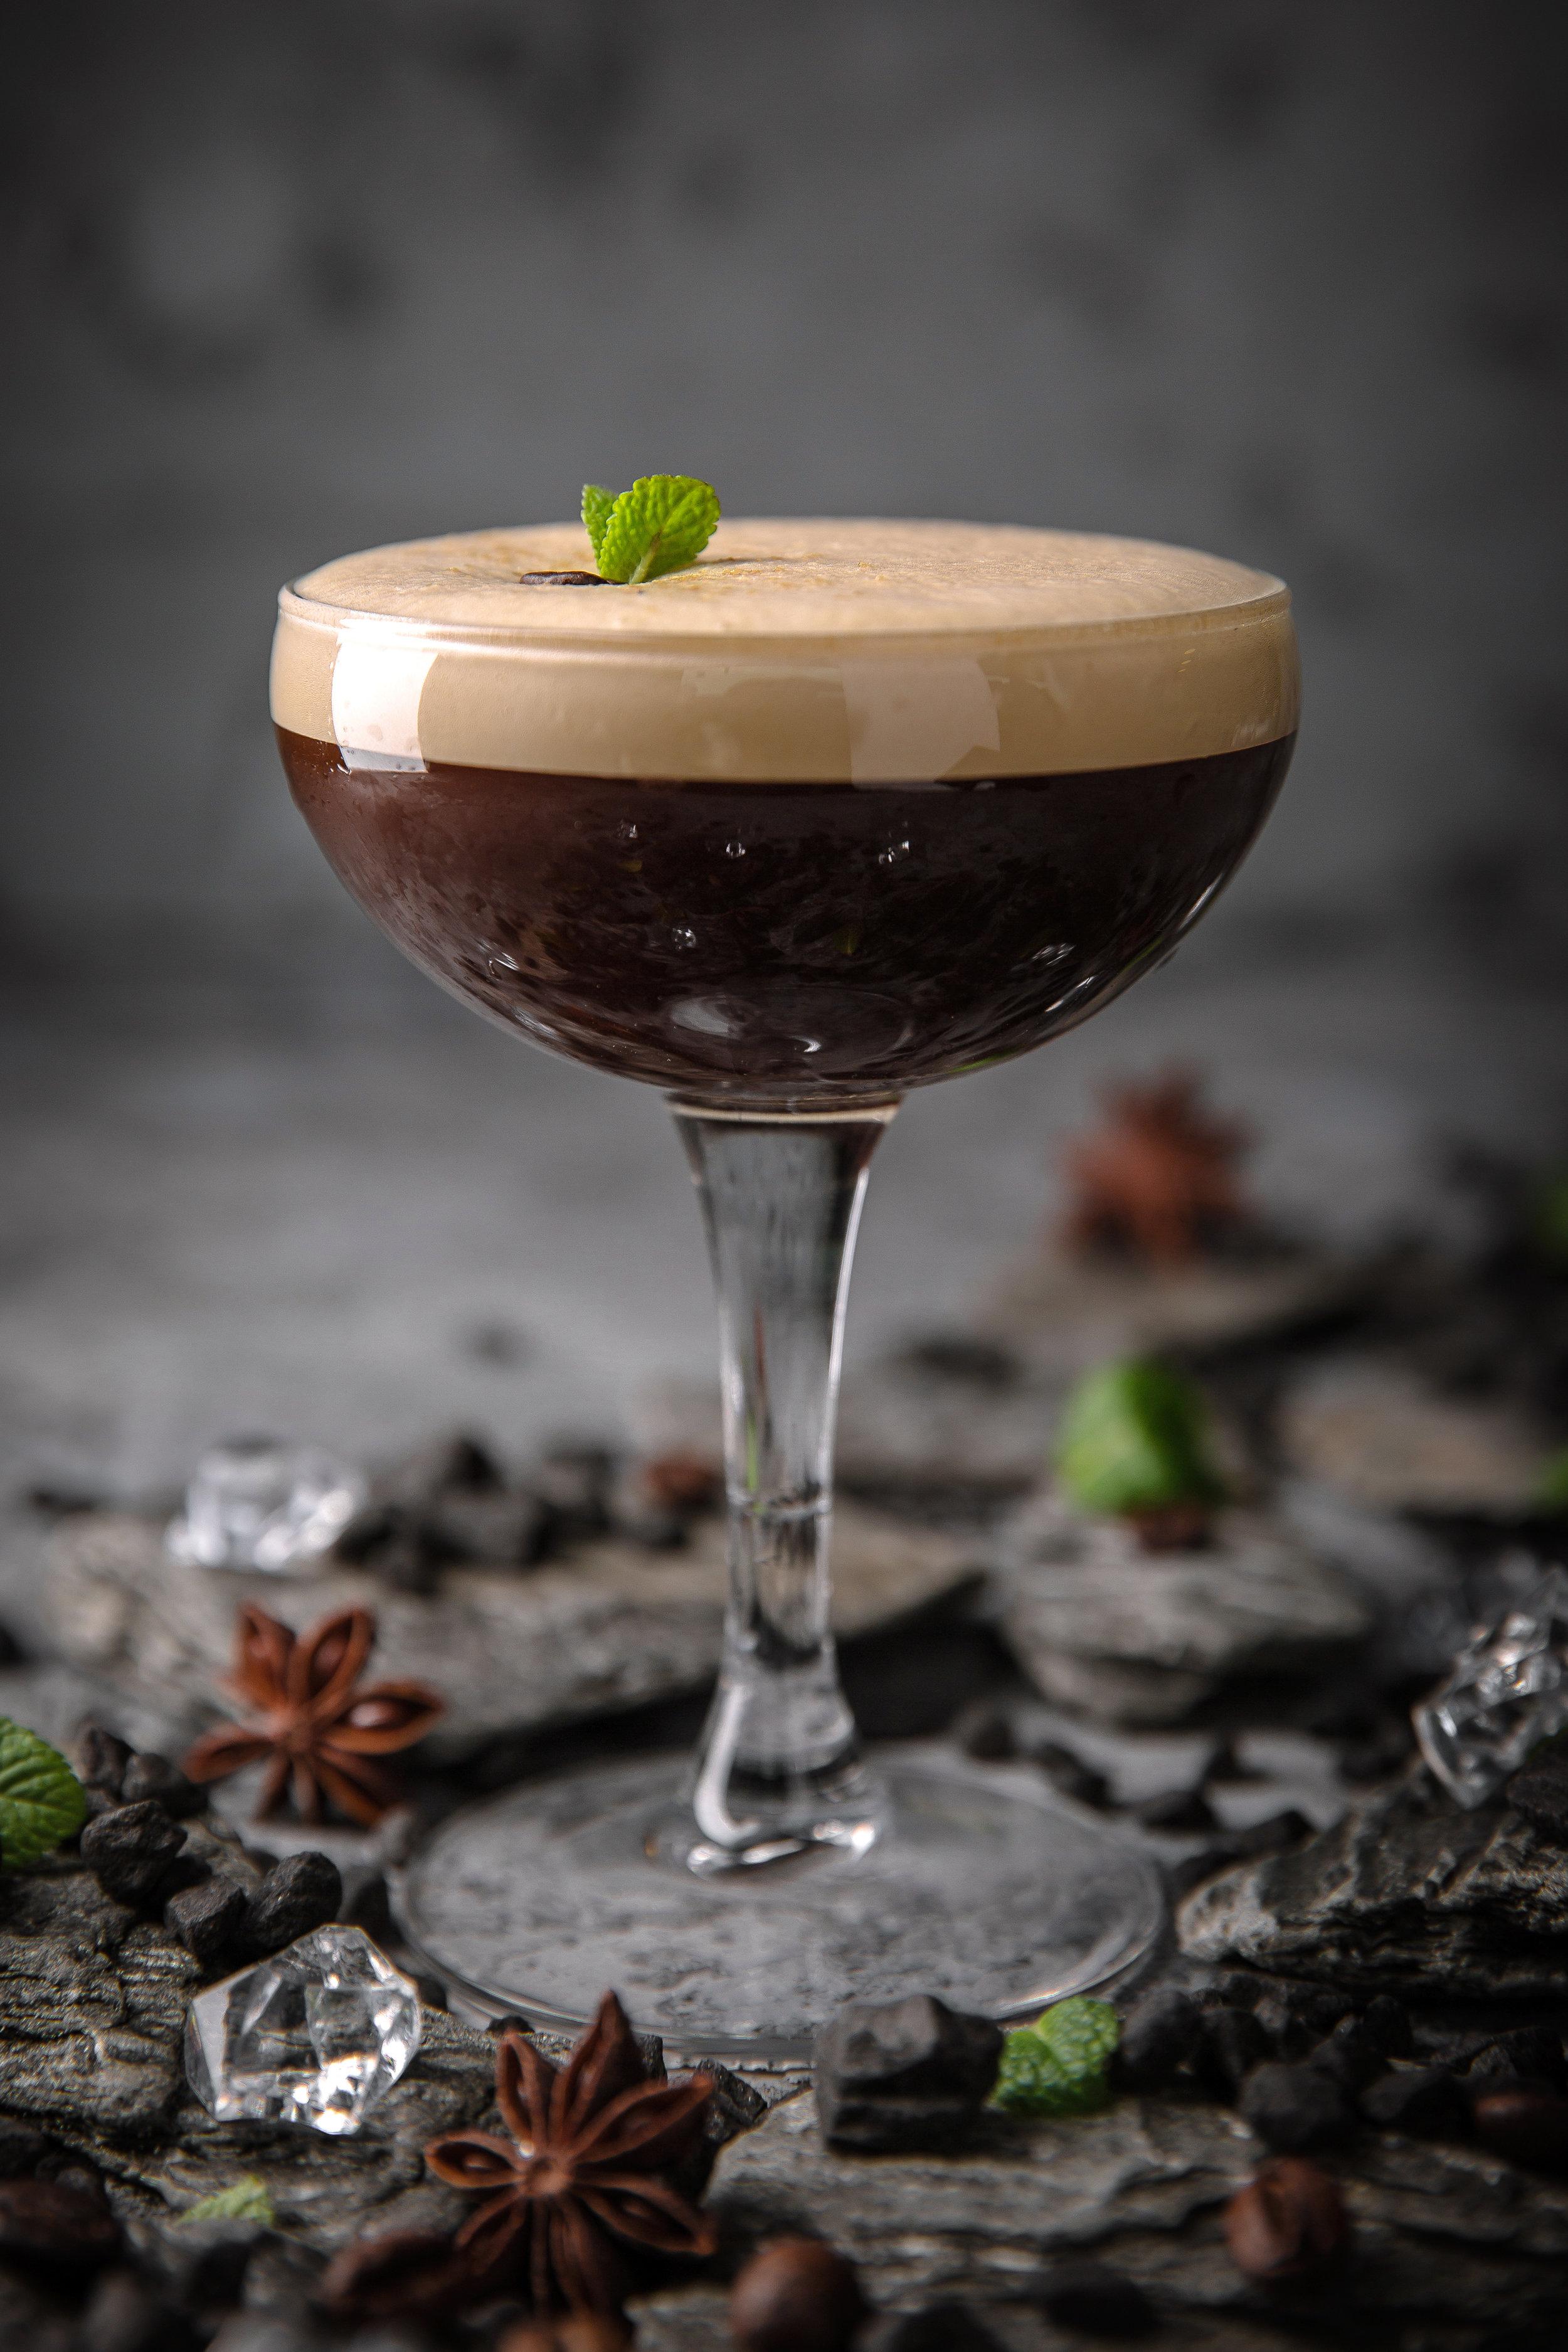 Kingdom Of Passion - 1 oz. espresso coffee, 1 oz. Lab's Old Timer's tonic syrup, ½ oz. Absente 55 Absinthe, 1 ½ oz. Tia Maria coffee liqueur, 2 oz. milk + .5 oz. vanilla liquor to cover.